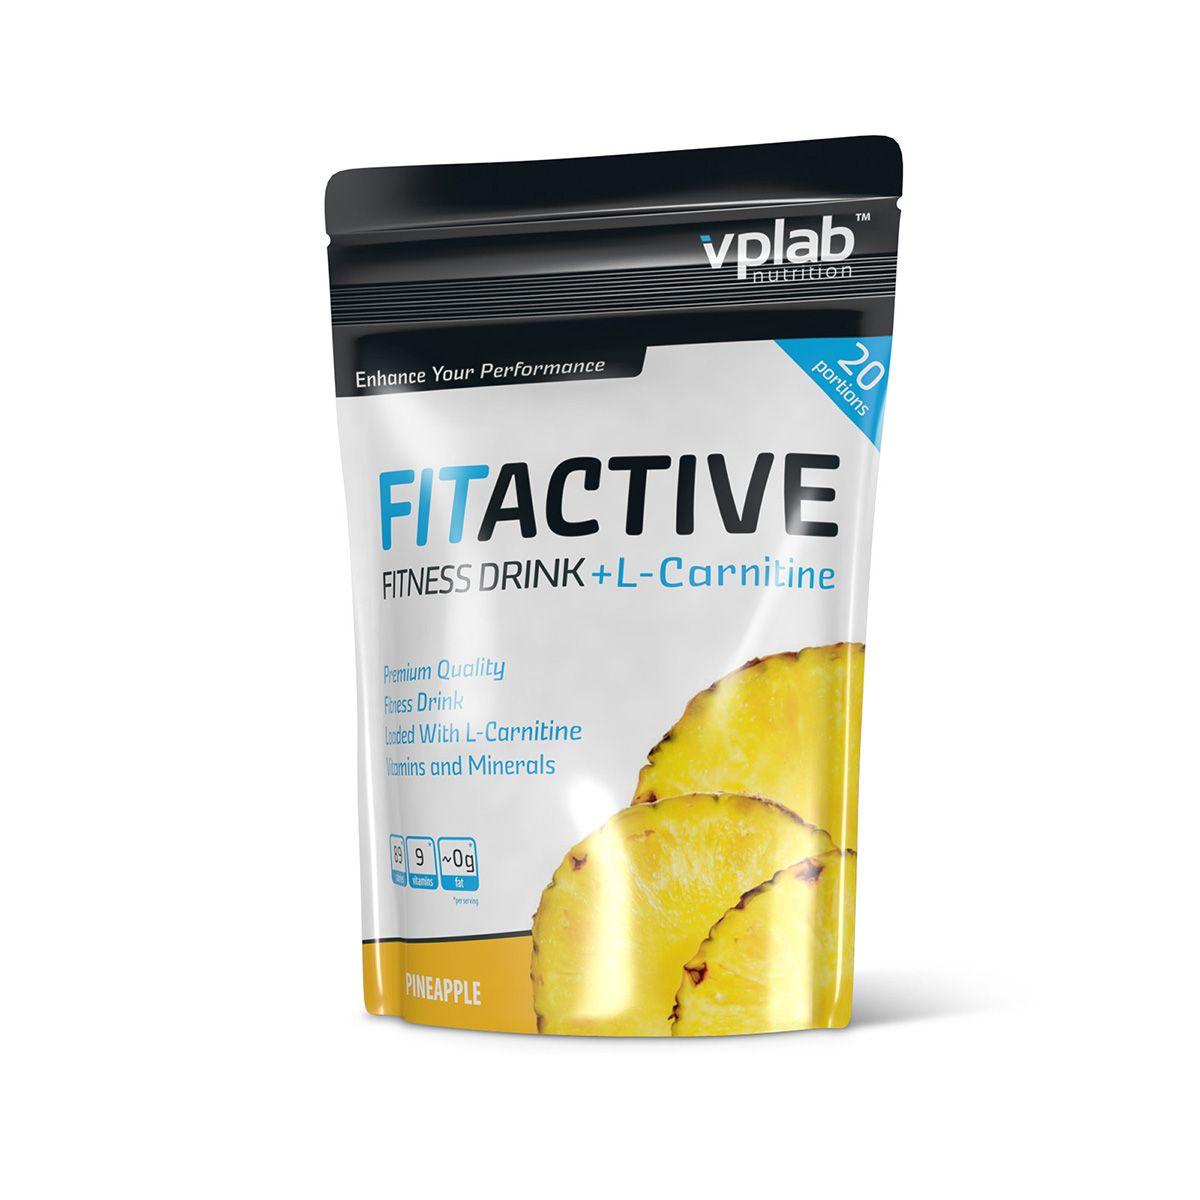 Карнитин VPLab FitActive Fitness Drink + L-Carnitine, ананас, 500 г напиток mychoice nutrition my fitness l carnitine 2700 shot клубника 9 x 60 мл